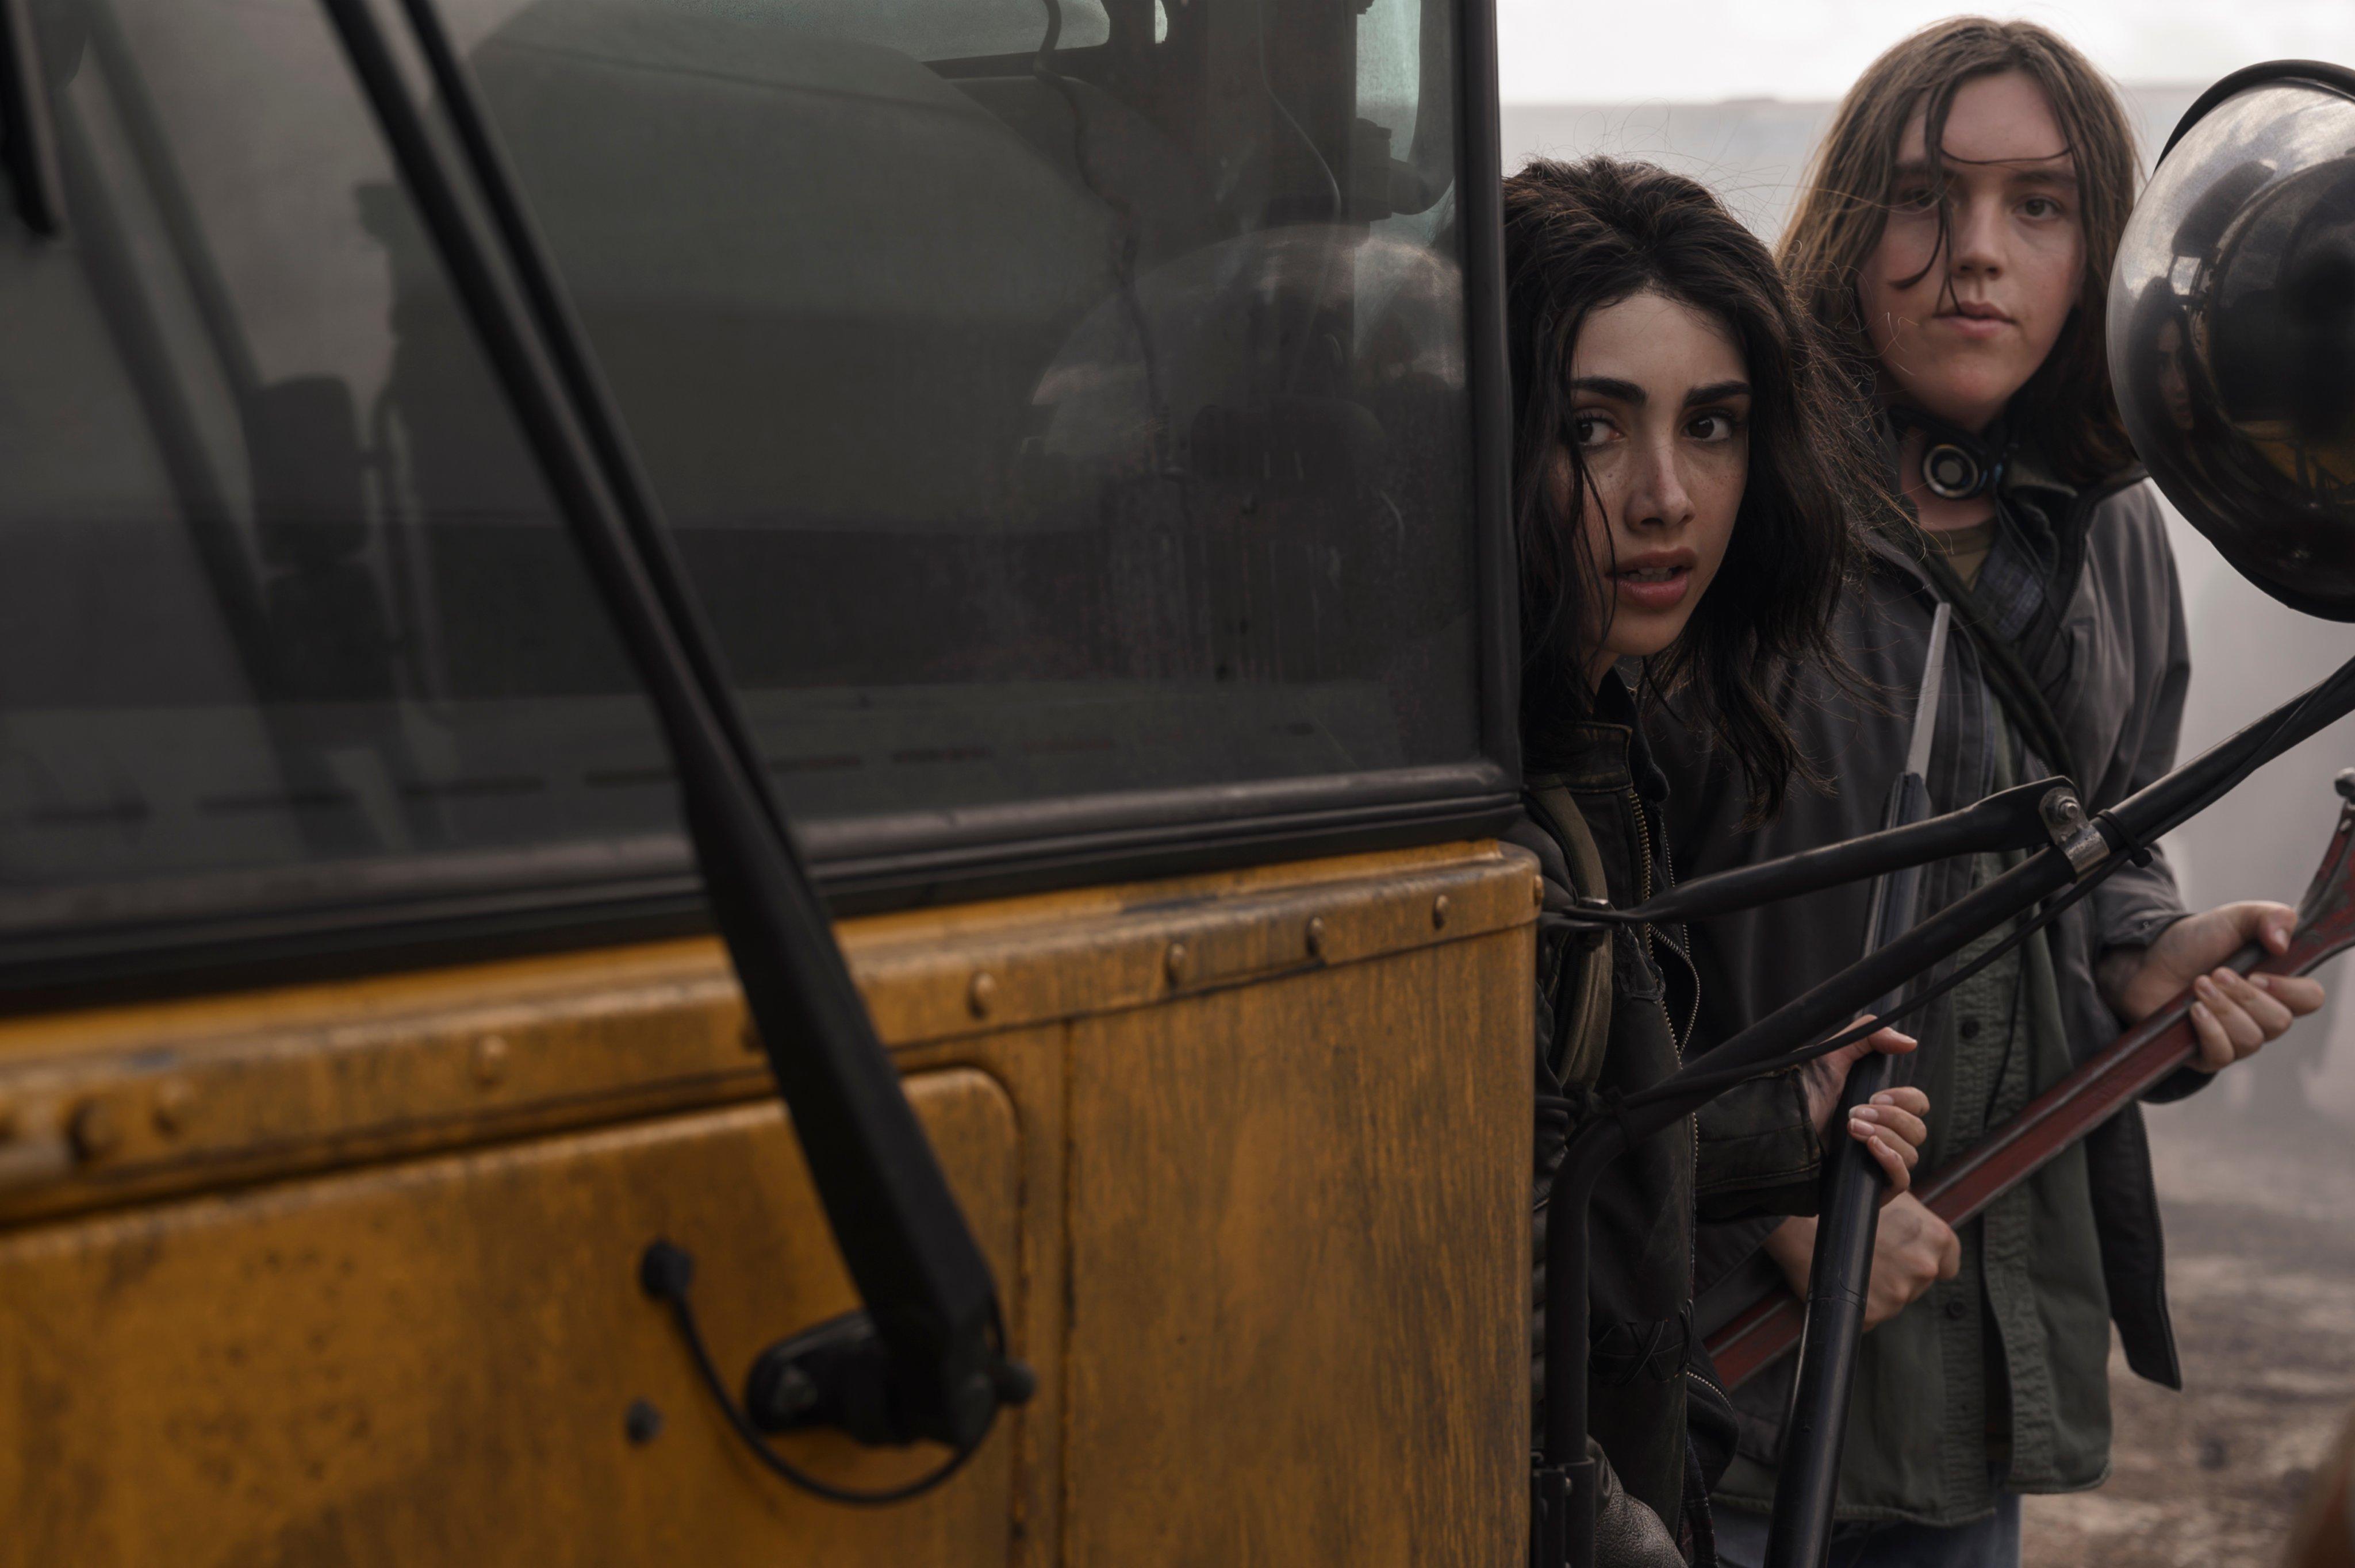 Novo spinoff de The Walking Dead ganha primeiro trailer | Pipoca Moderna